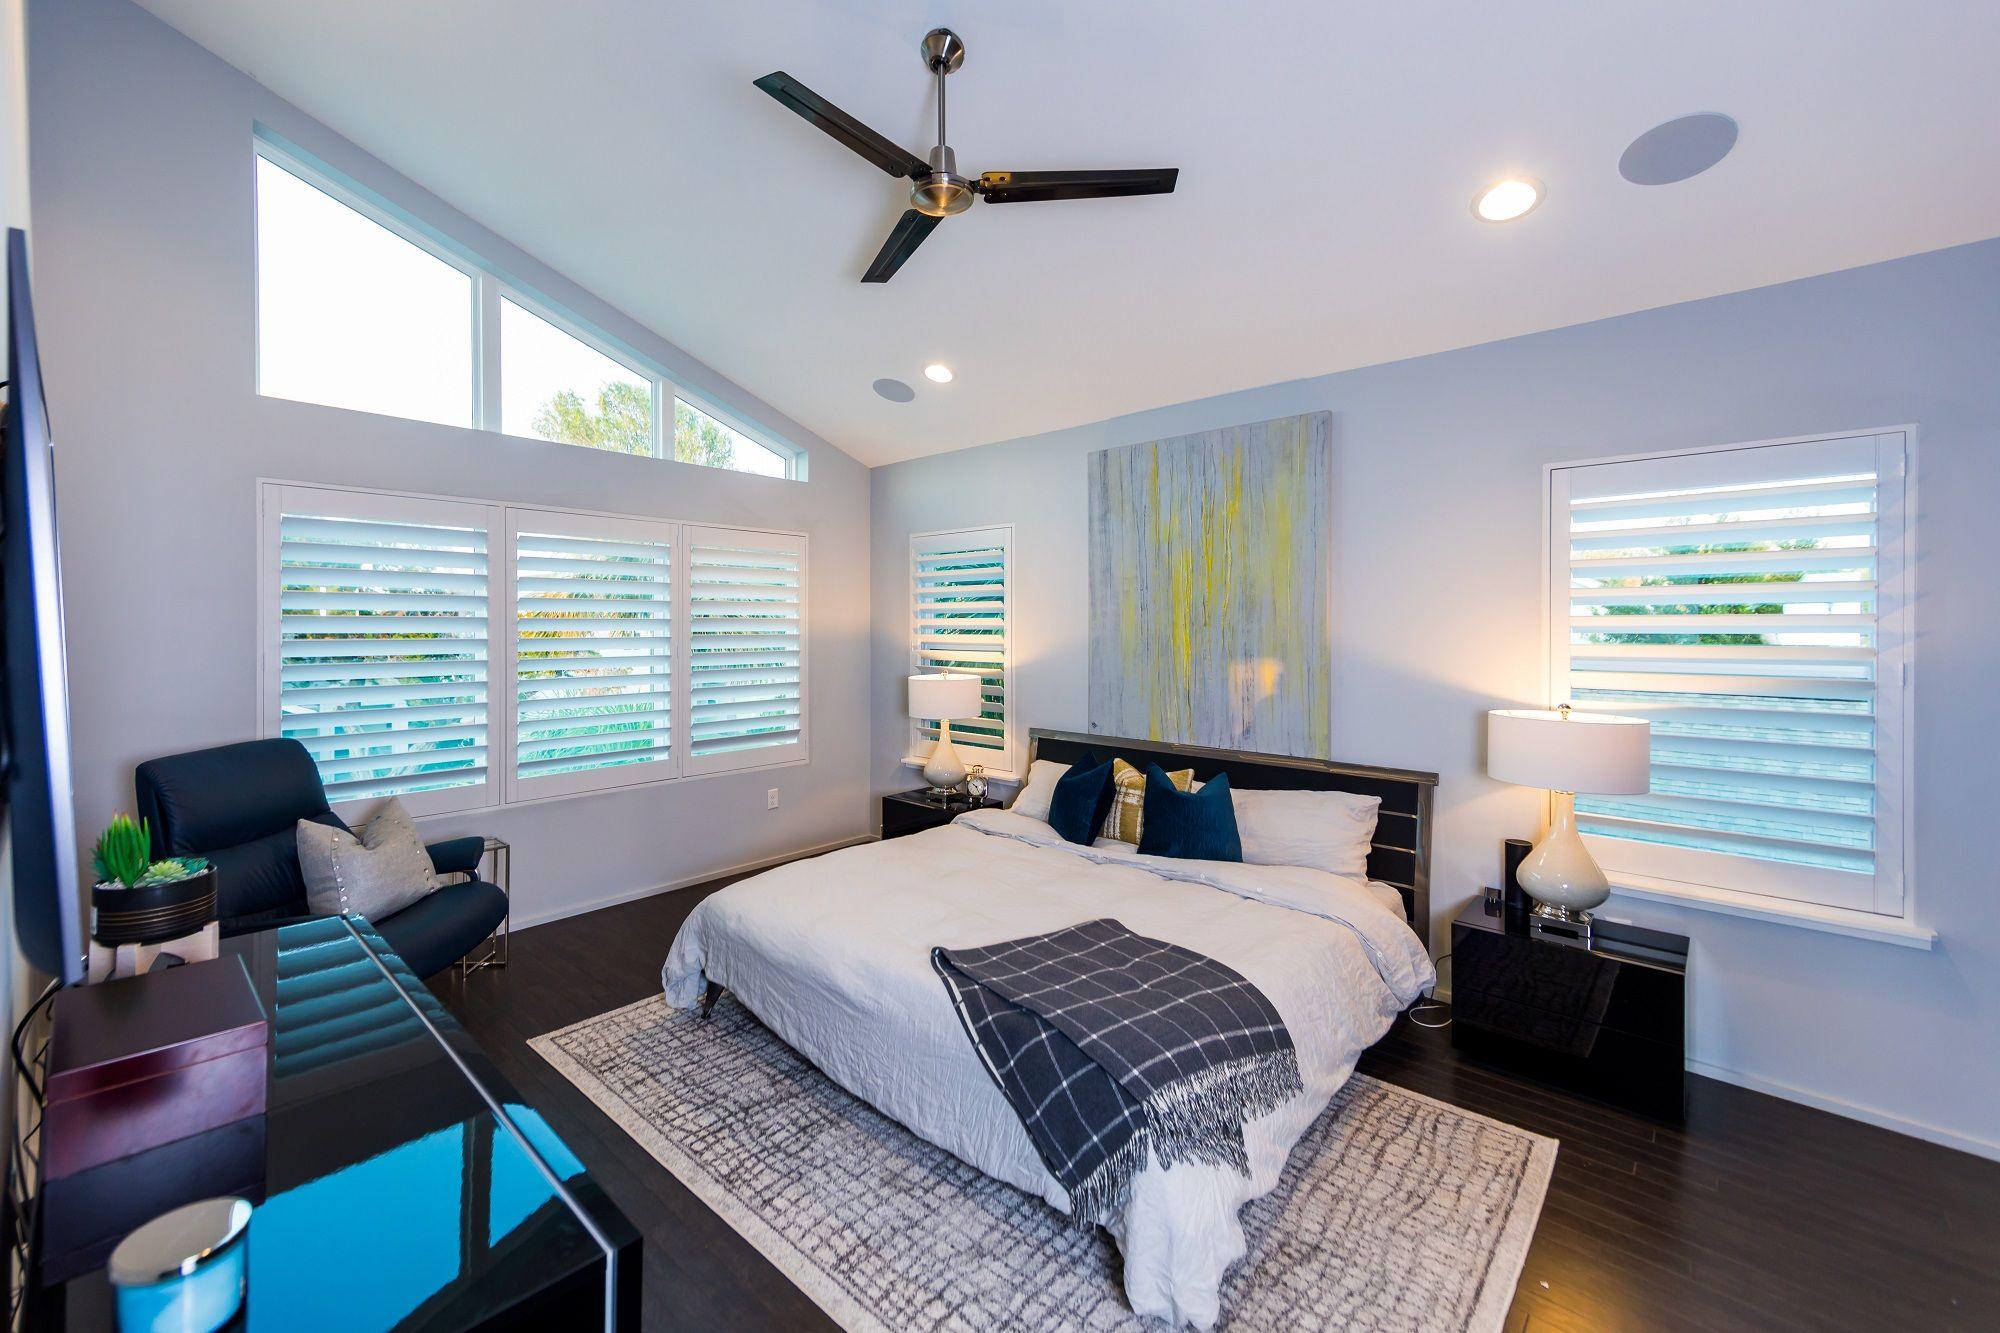 DreamDesign®30 Home bedroom, Room interior